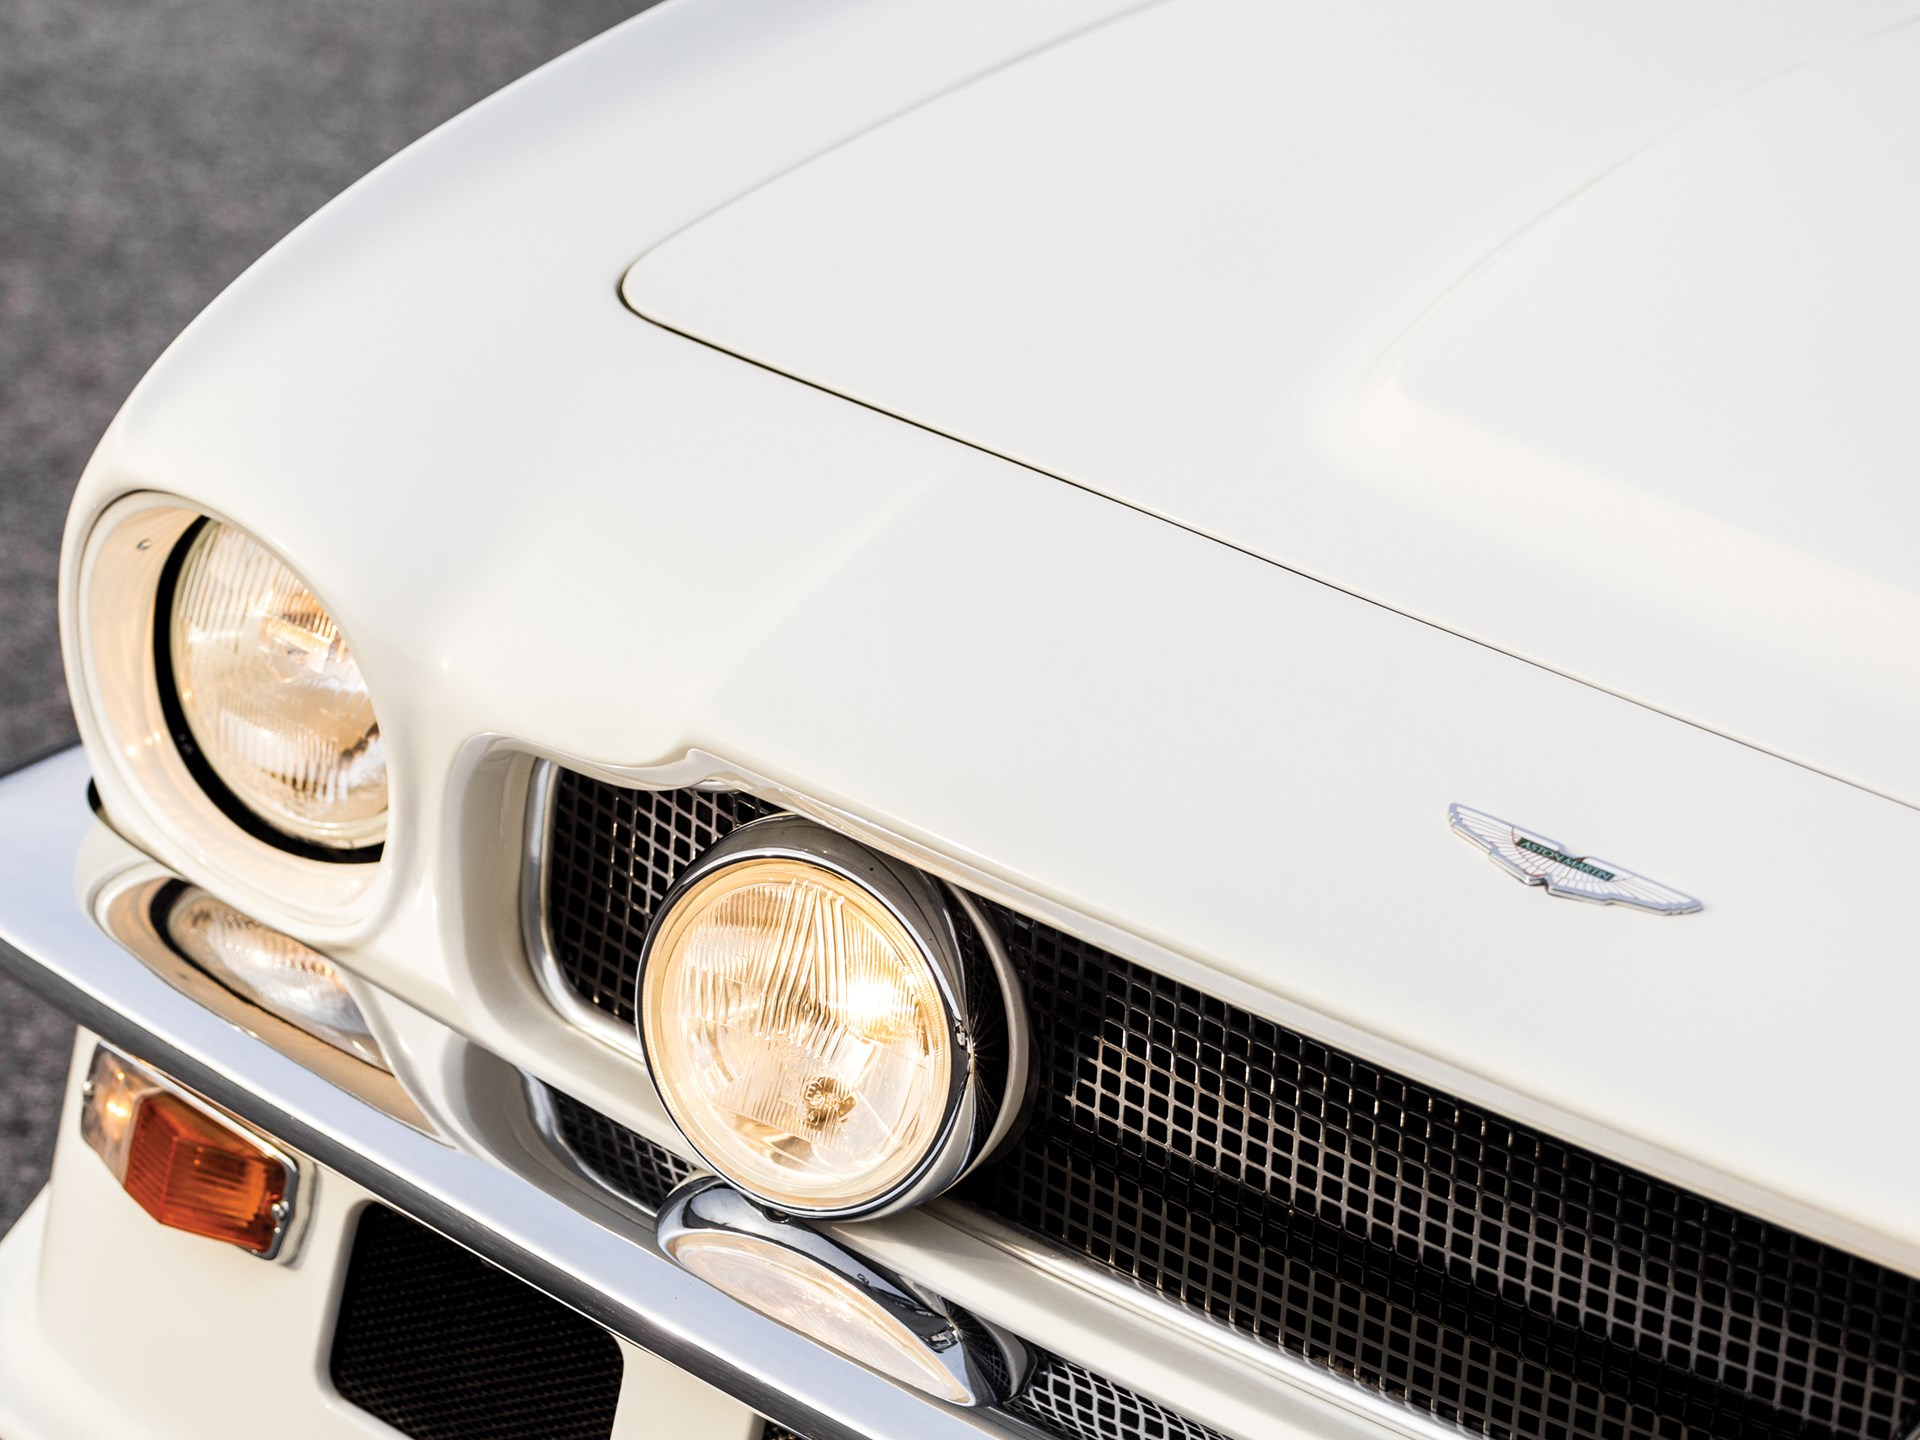 1983 Aston Martin V8 Vantage V580 'Oscar India'